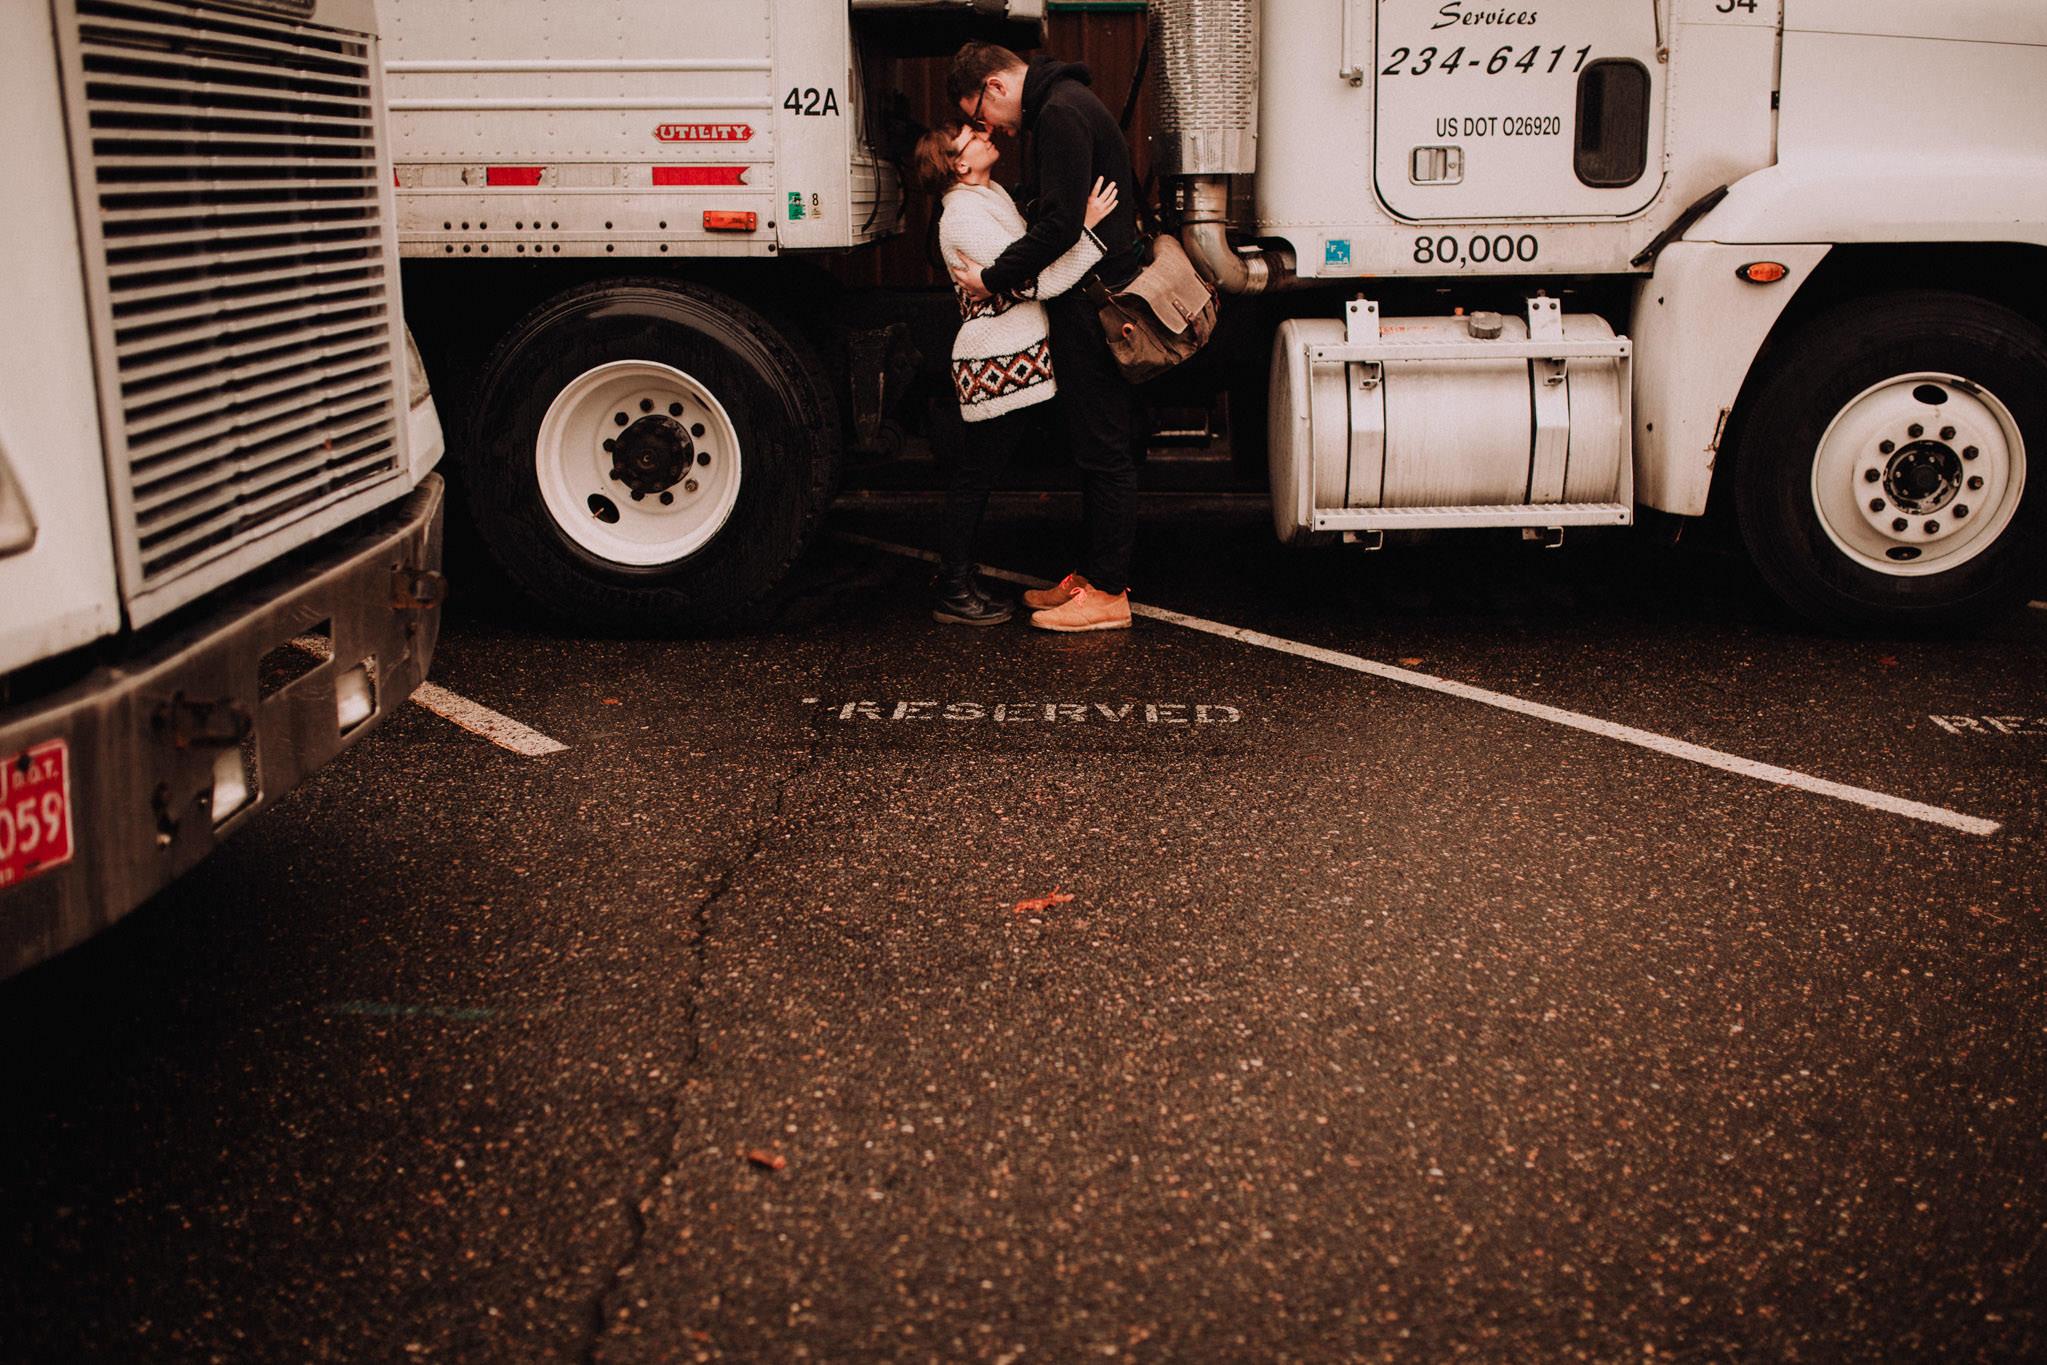 oregon-wedding-elopement-photographer-donmashelen-bringas31